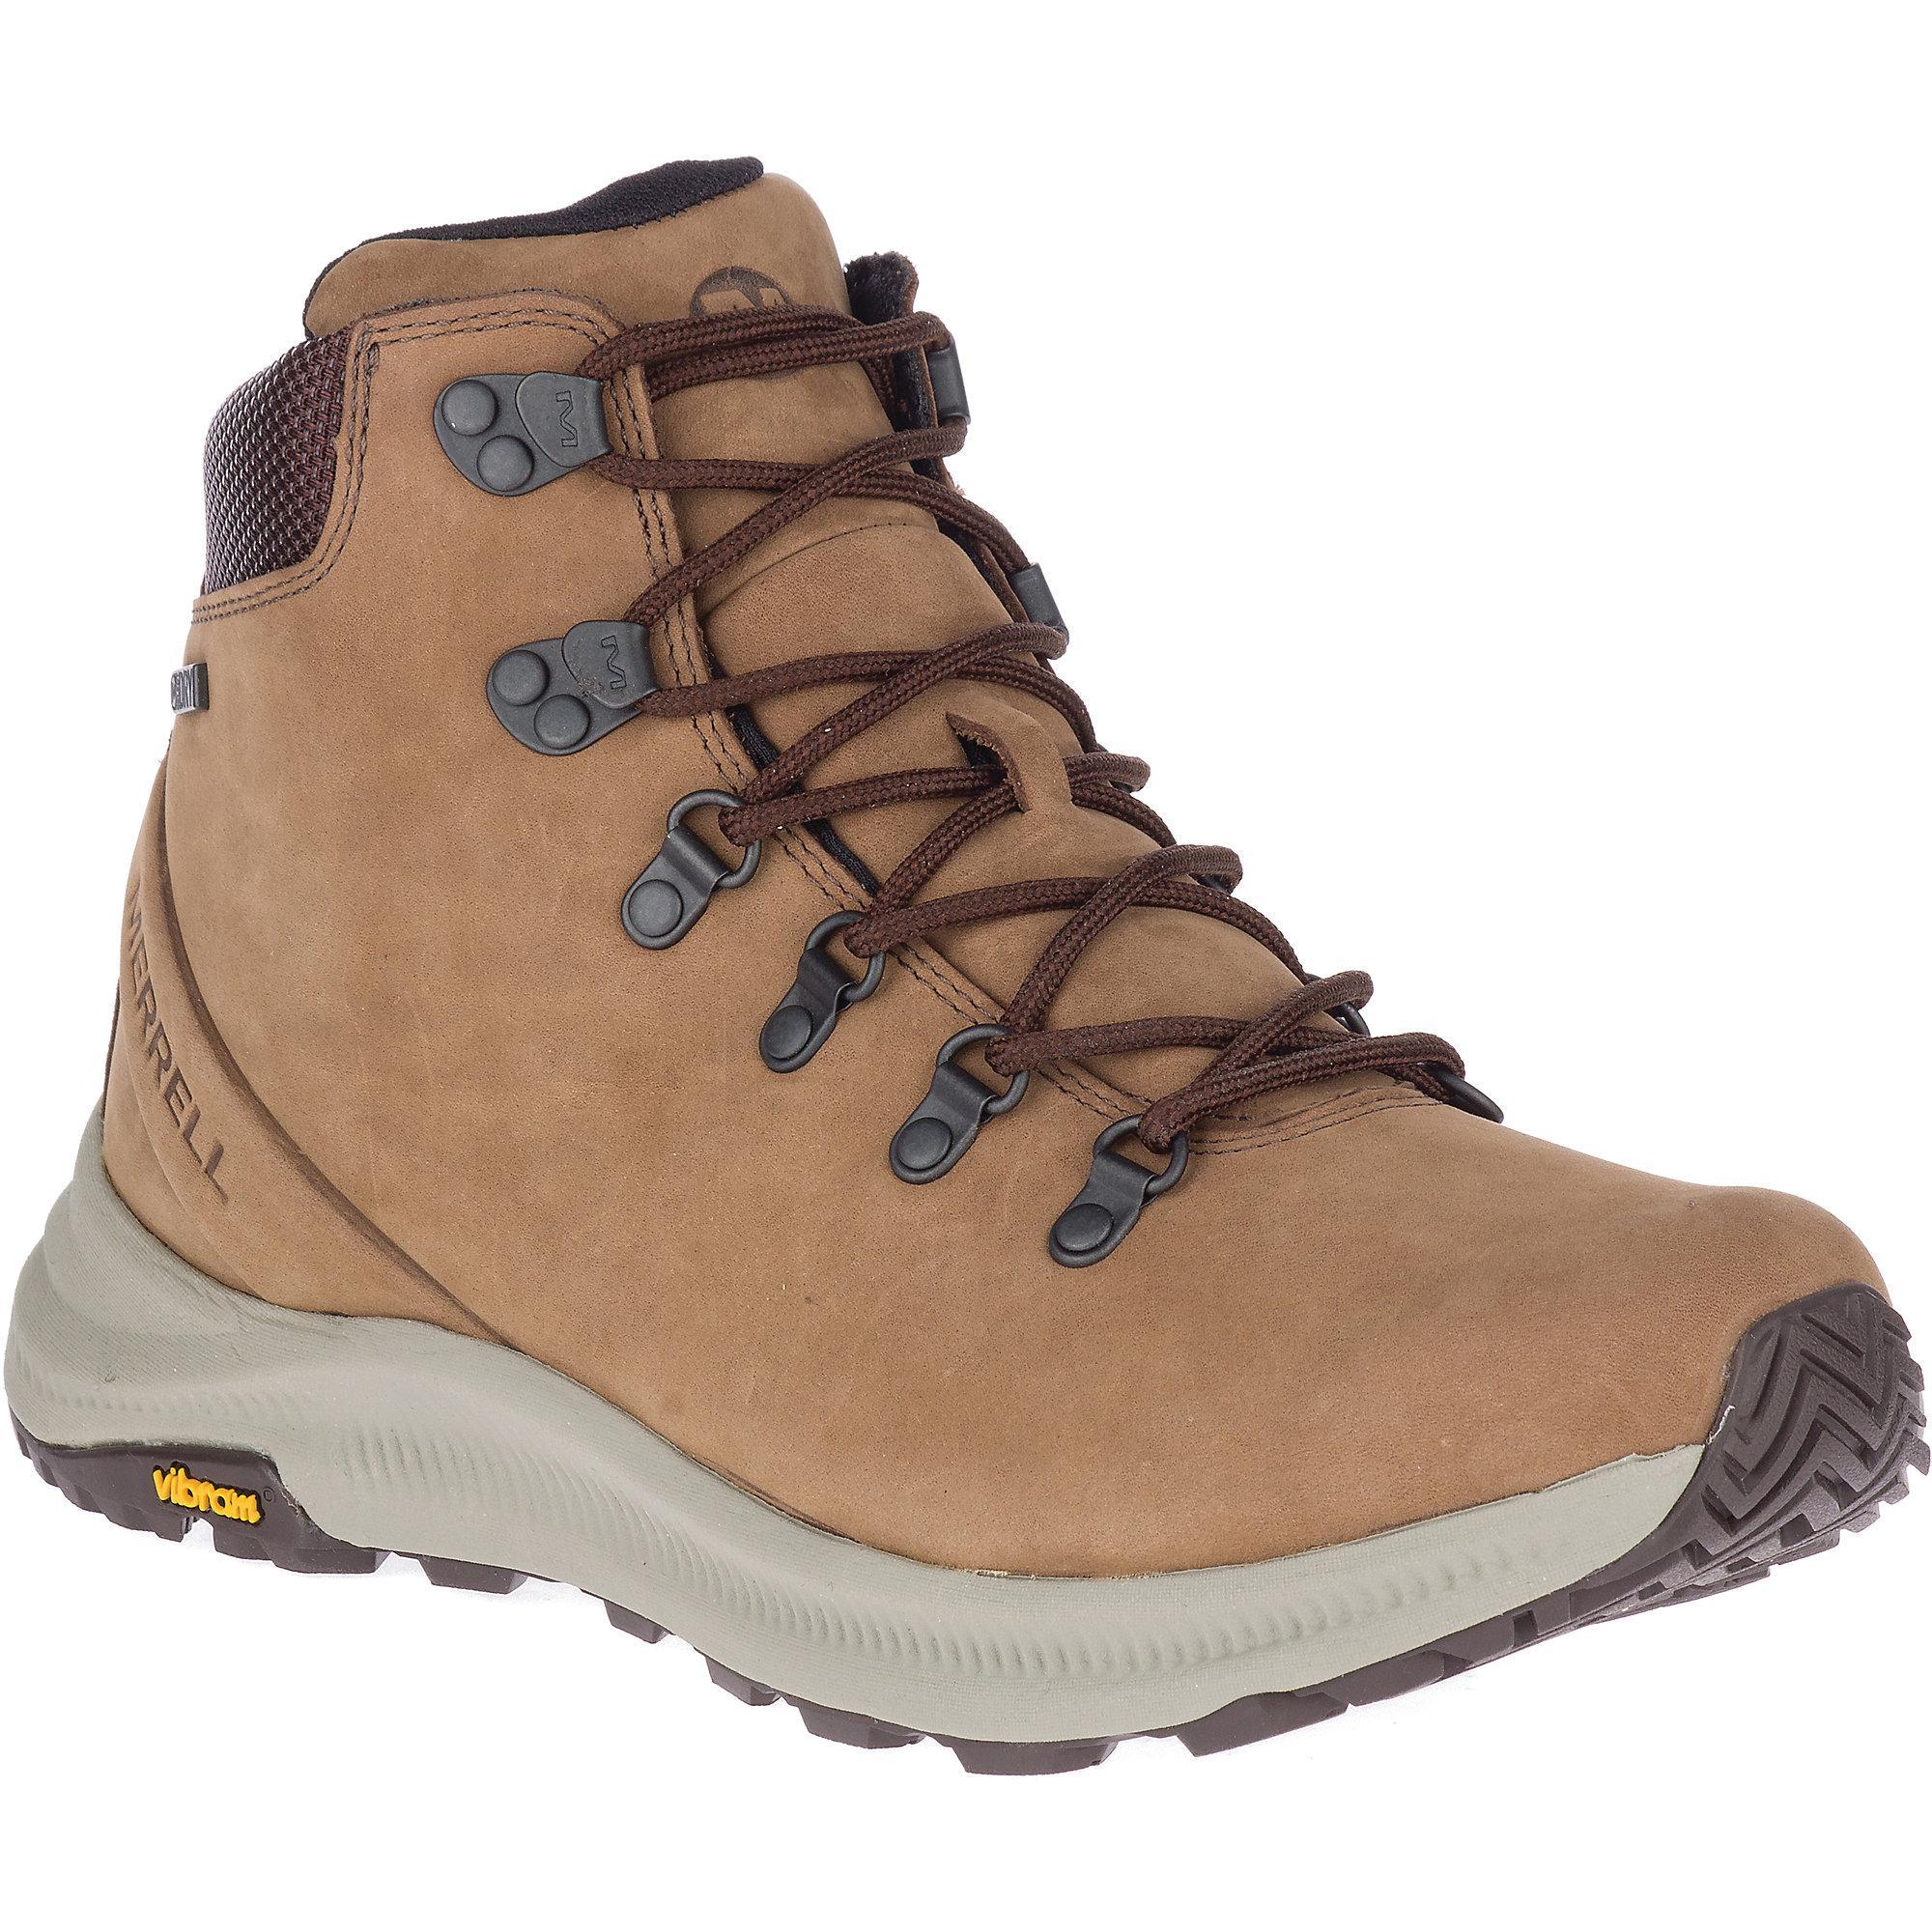 873cf825a70 Merrell Ontario Mid Waterproof Shoe in Brown for Men - Lyst